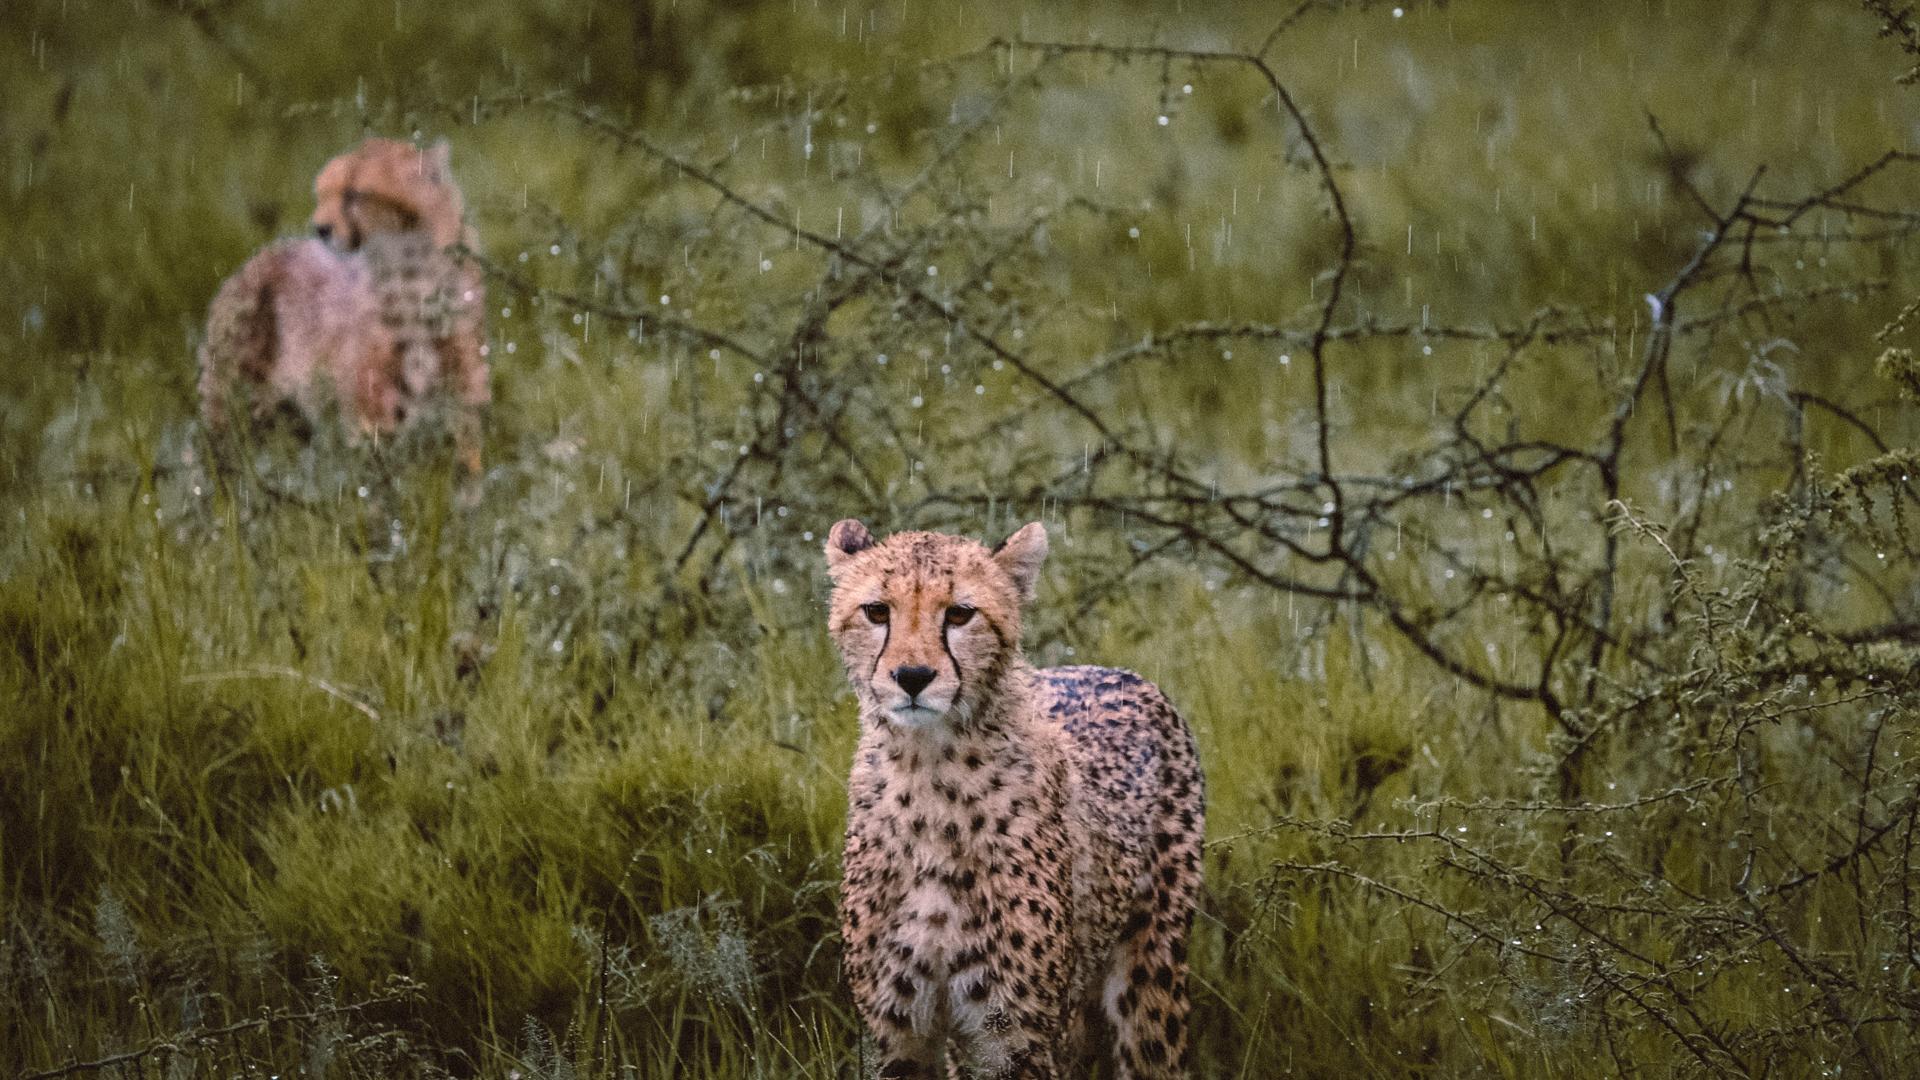 Two cheetahs in the rain in the Serengeti National Park, Tanzania